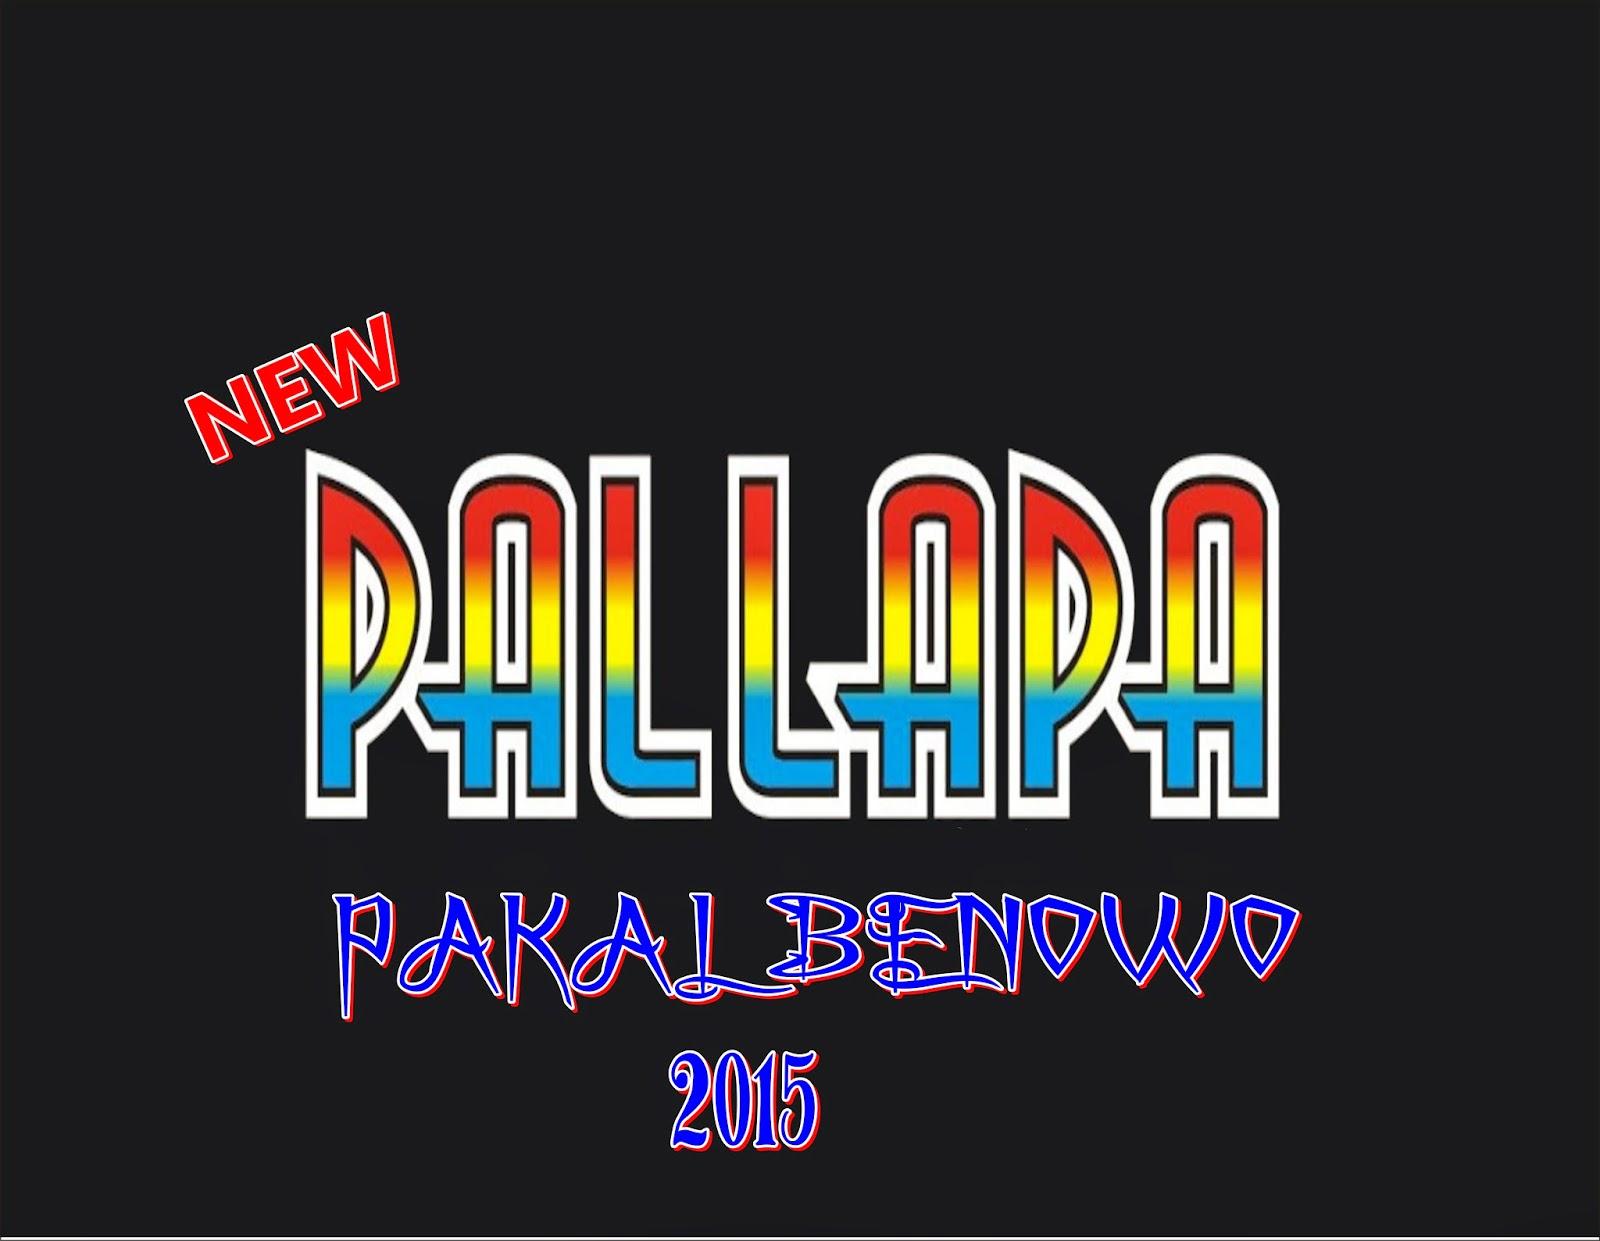 NEW PALLAPA LIVE PAKAL BENOWO 2015   blog zombie salah ketik